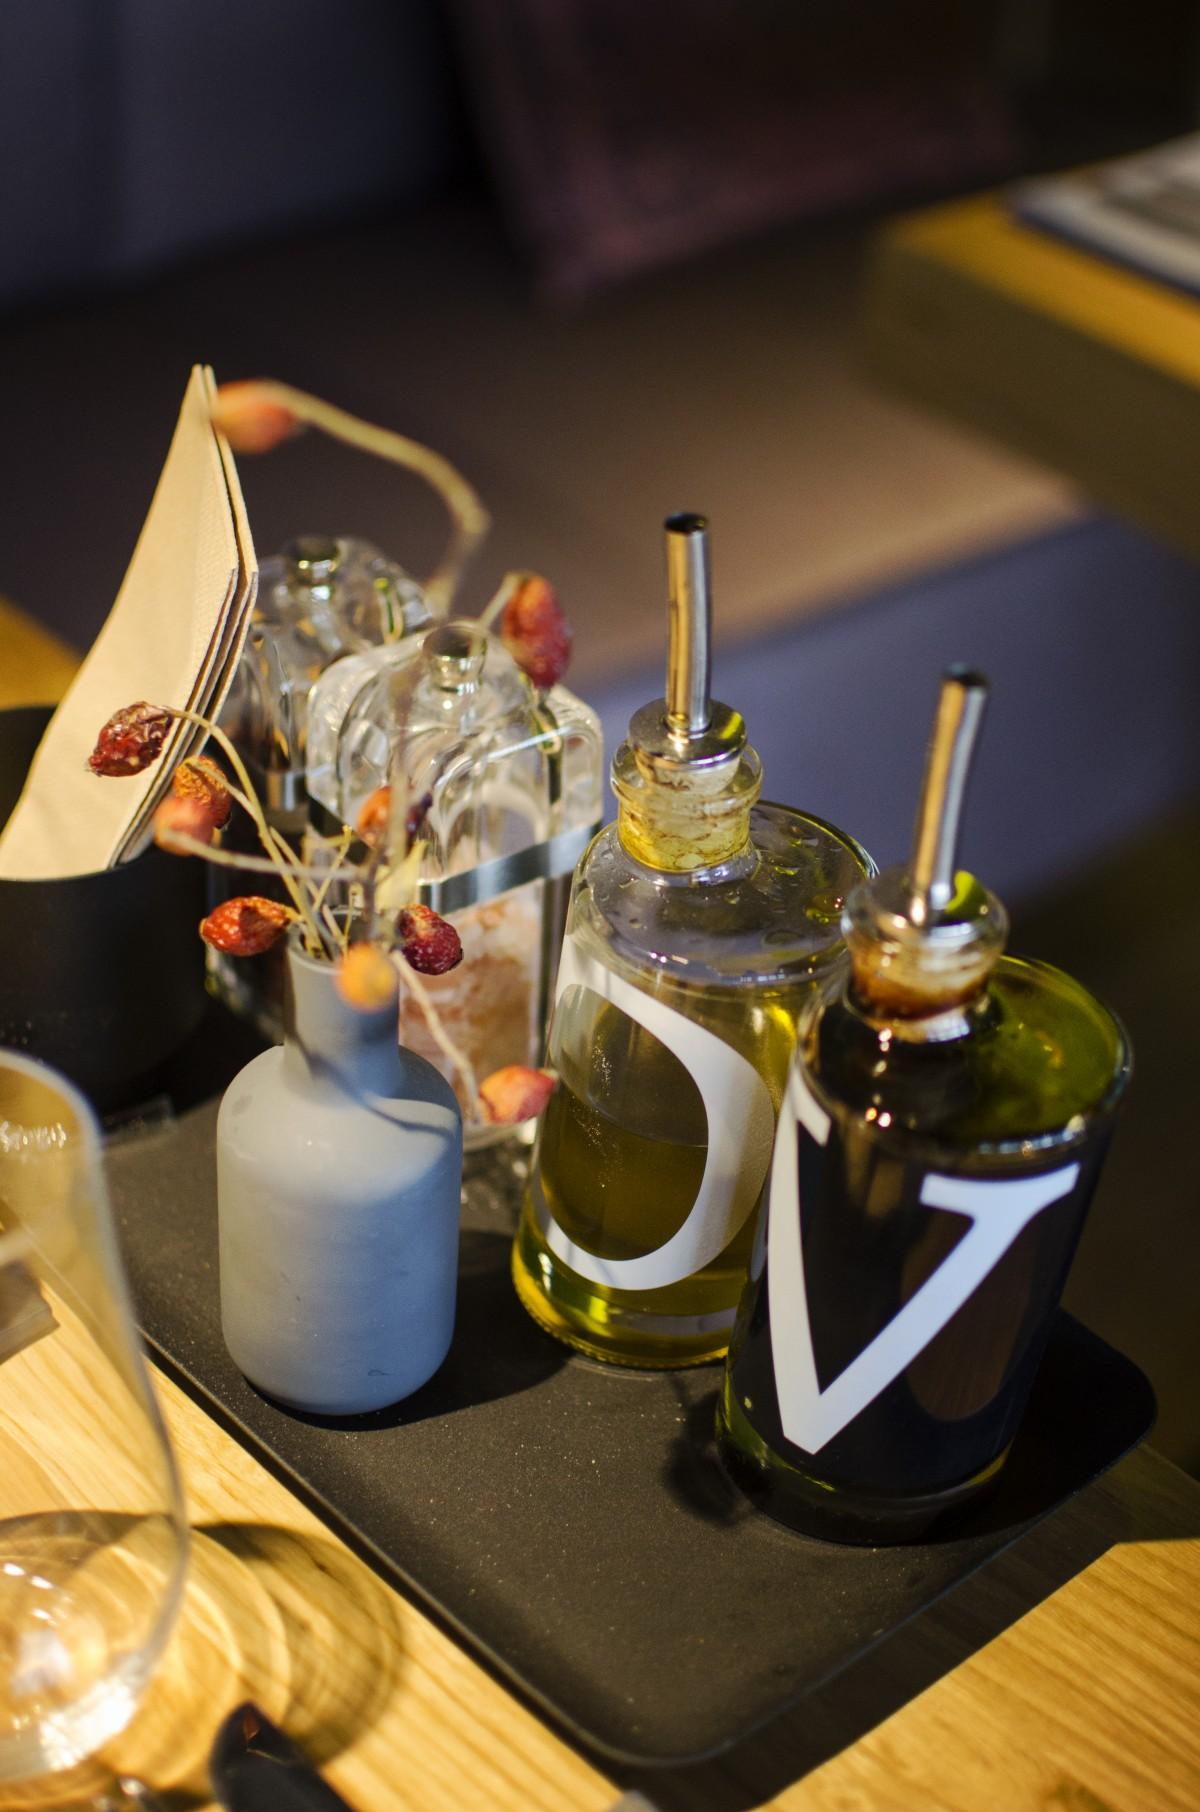 La Bottega Monte: чиста, интересна и изискана храна